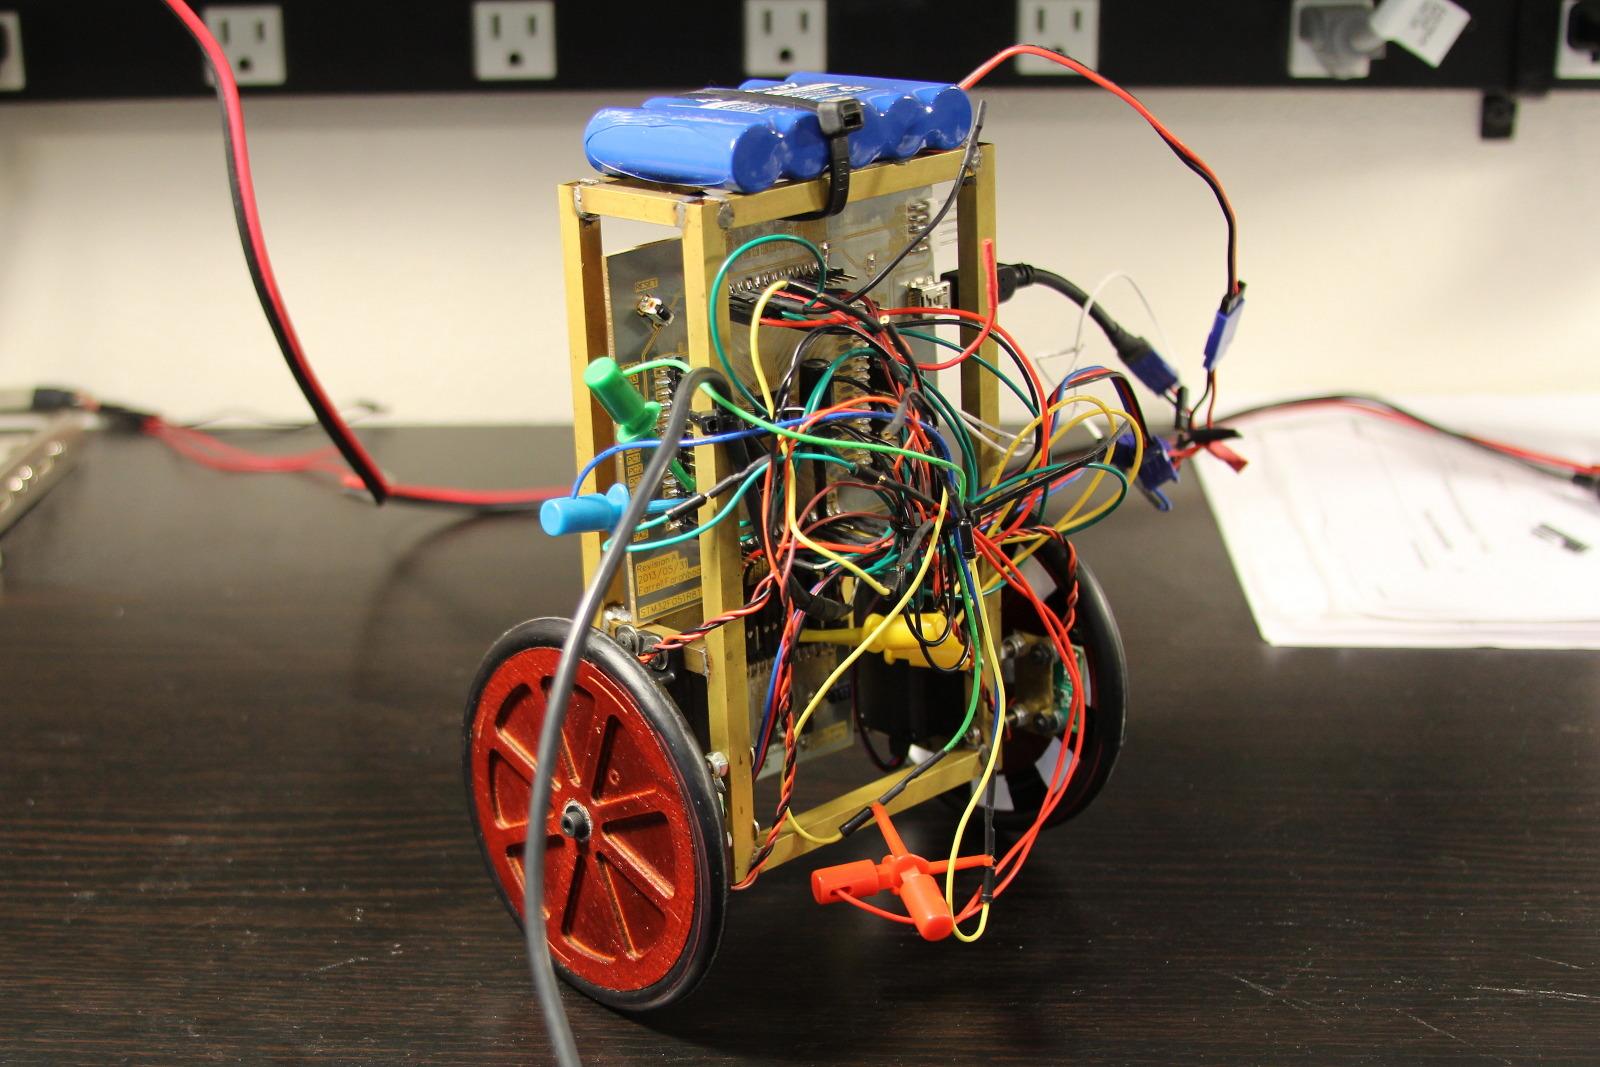 robot_pre_pcb farrellf com,Wiring A Robot